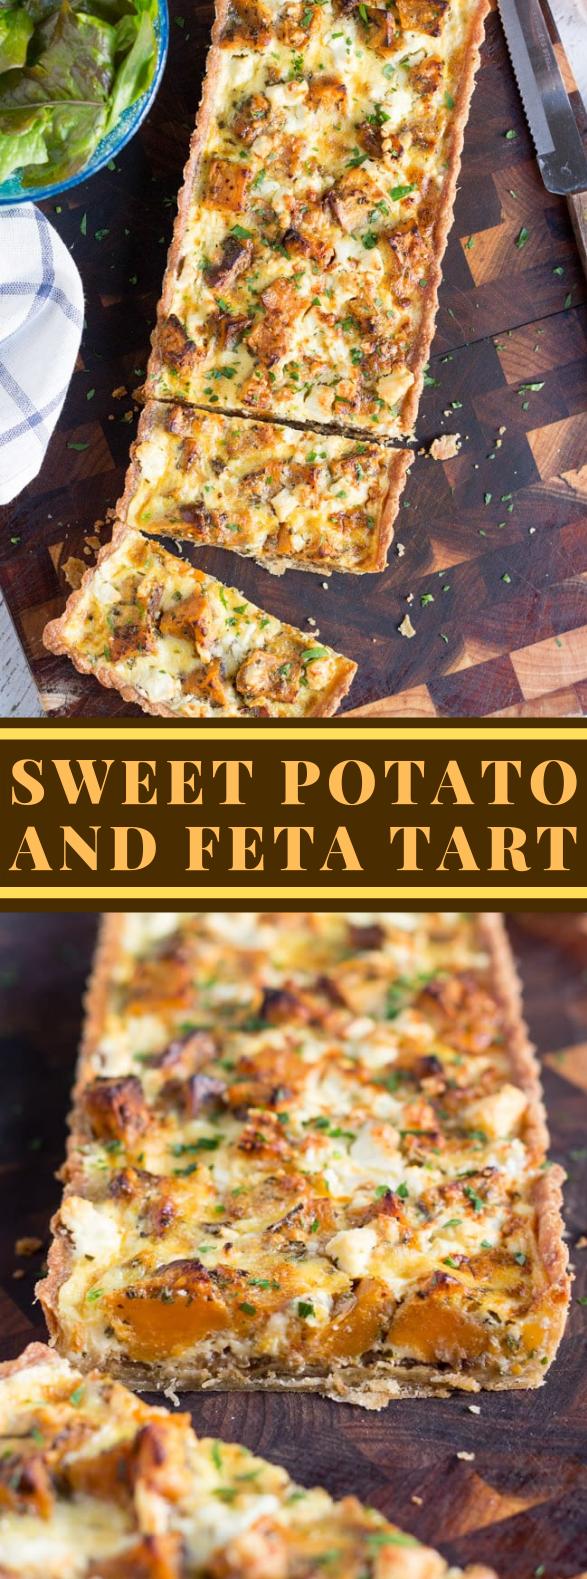 A SAVOURY SWEET POTATO, FETA AND CARAMELISED ONION TART #vegetarian #dinner